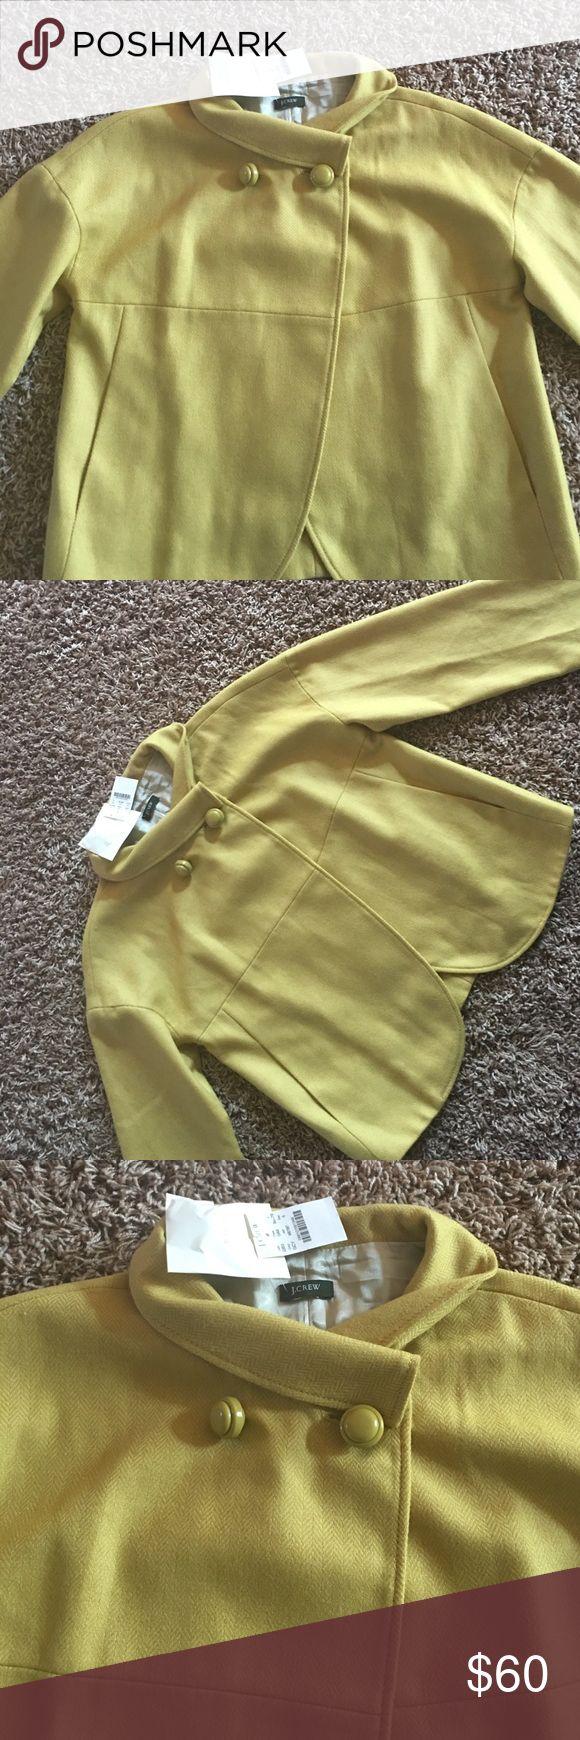 J CREW BLAZER 💕FINAL SALE💕 Never worn, mustard color in mint condition. J CREW Jackets & Coats Blazers